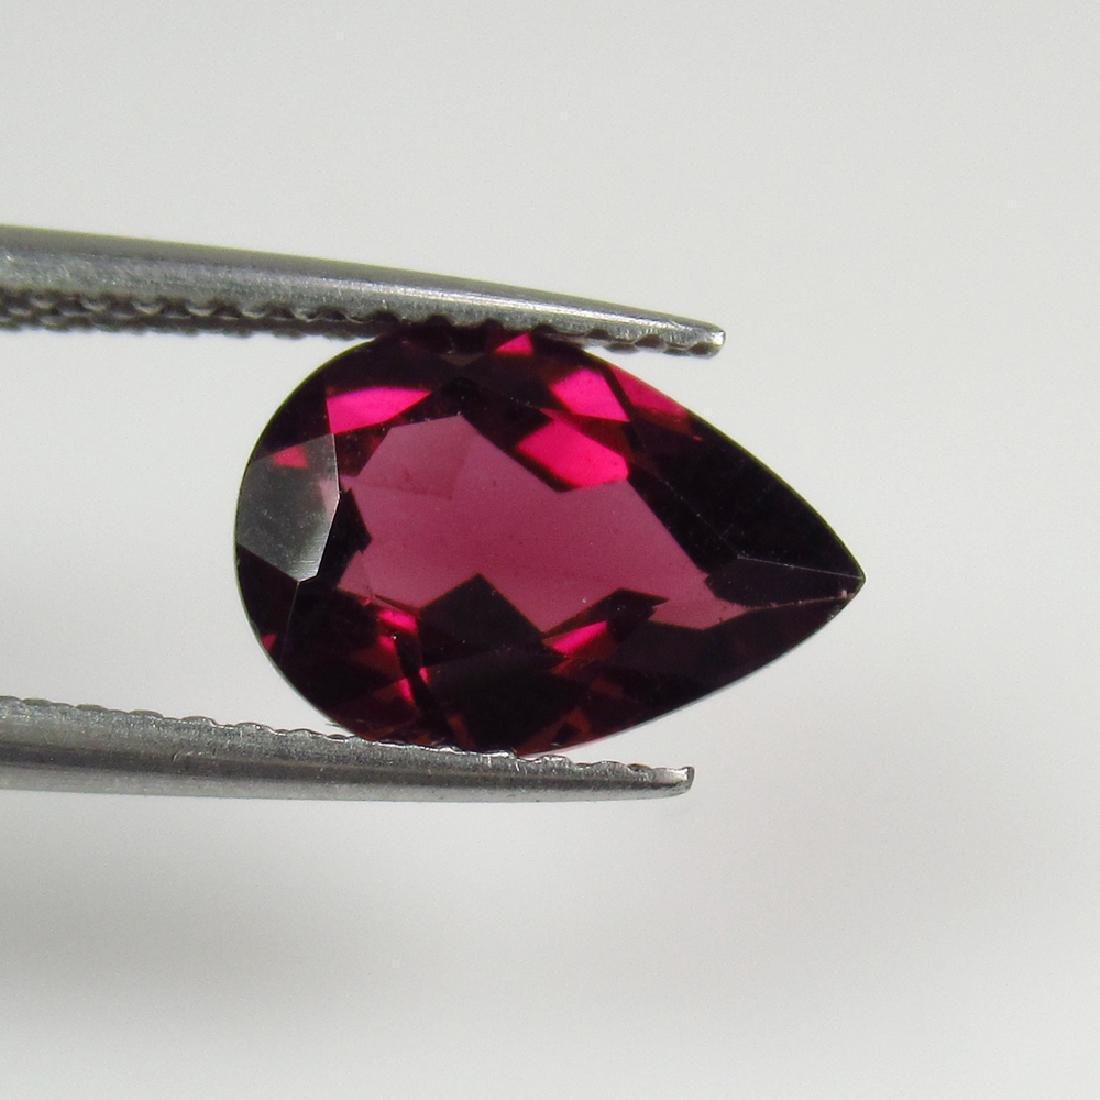 2.19 Ct Genuine Pink Rhodolite Garnet Pear Cut